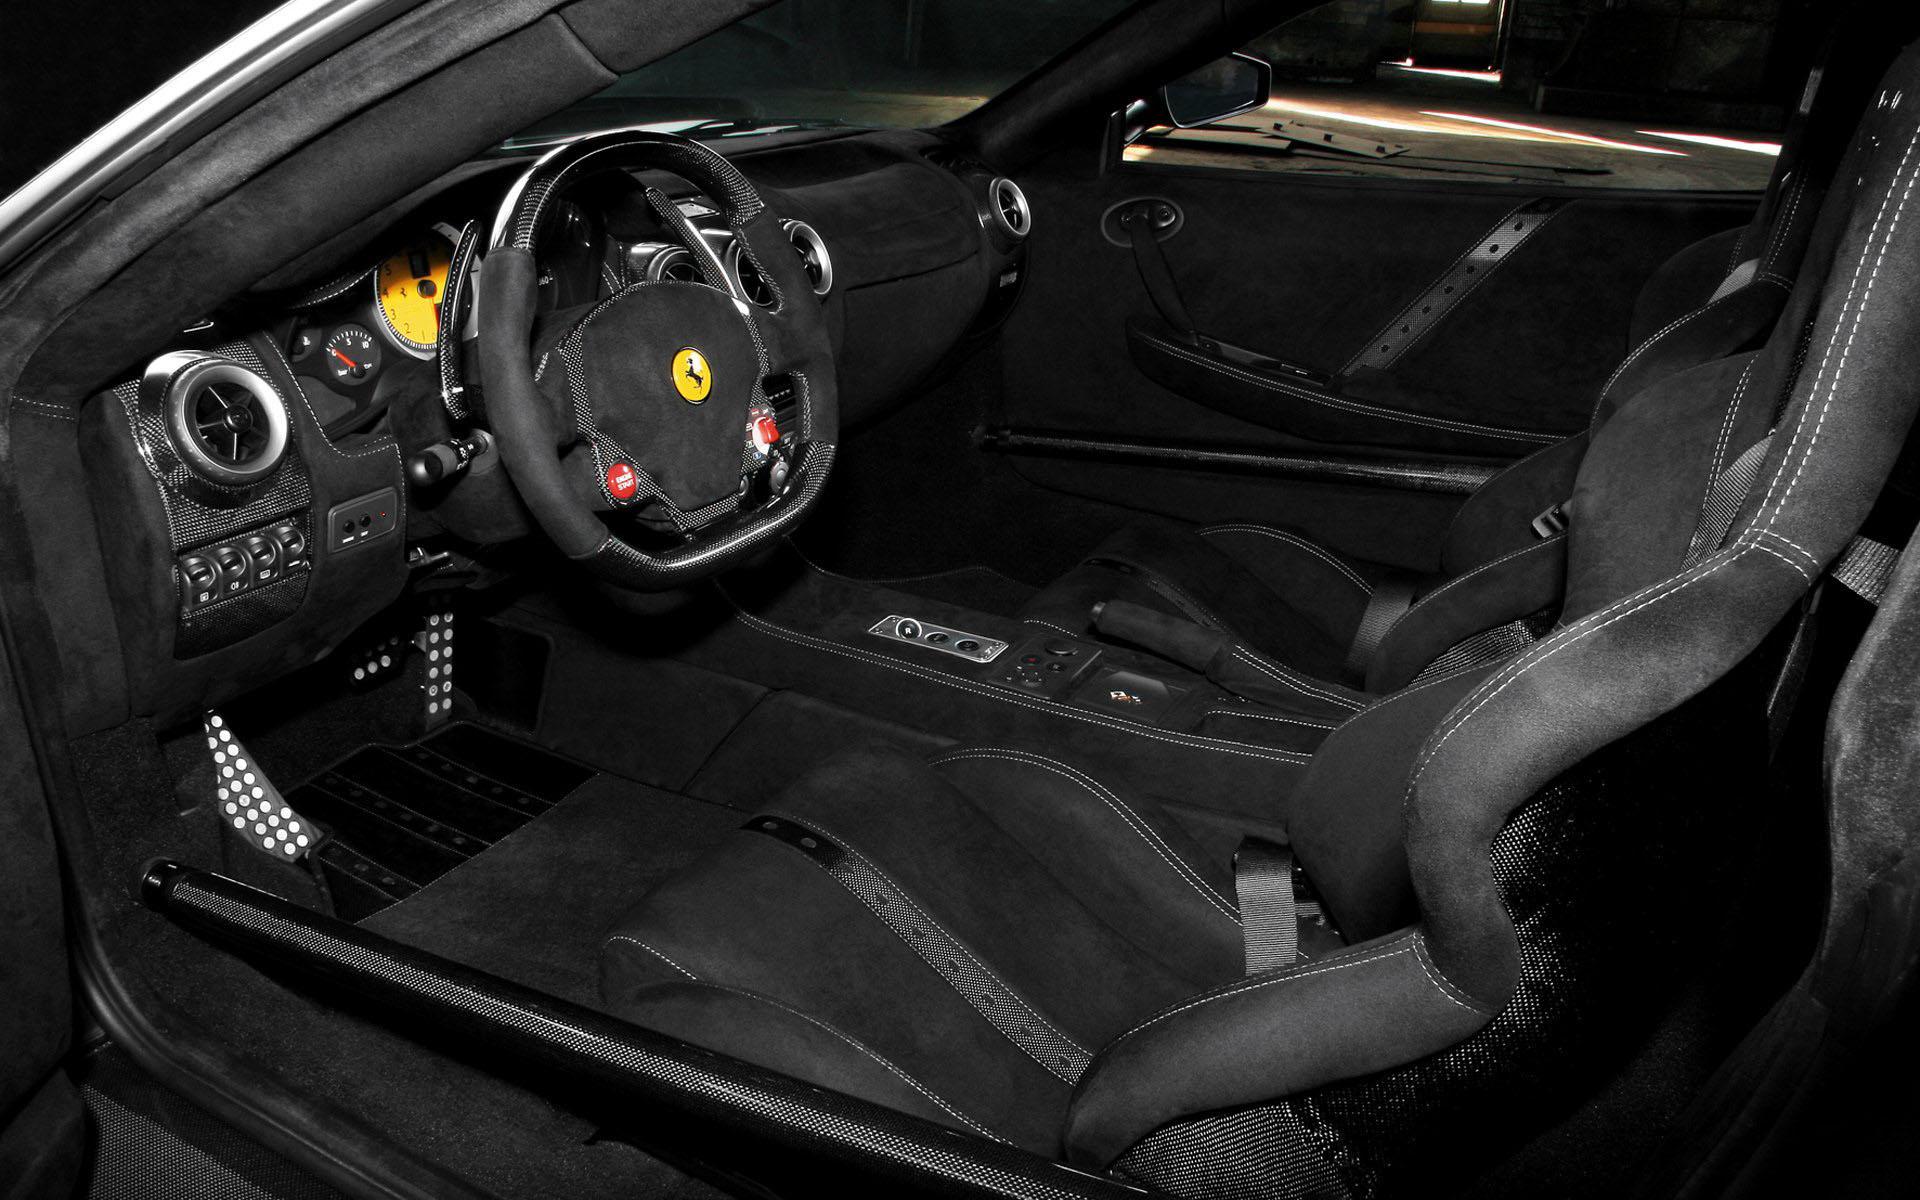 Fahrzeuge - Ferrari  Super Fast Cool Autos Fahrzeug Wallpaper